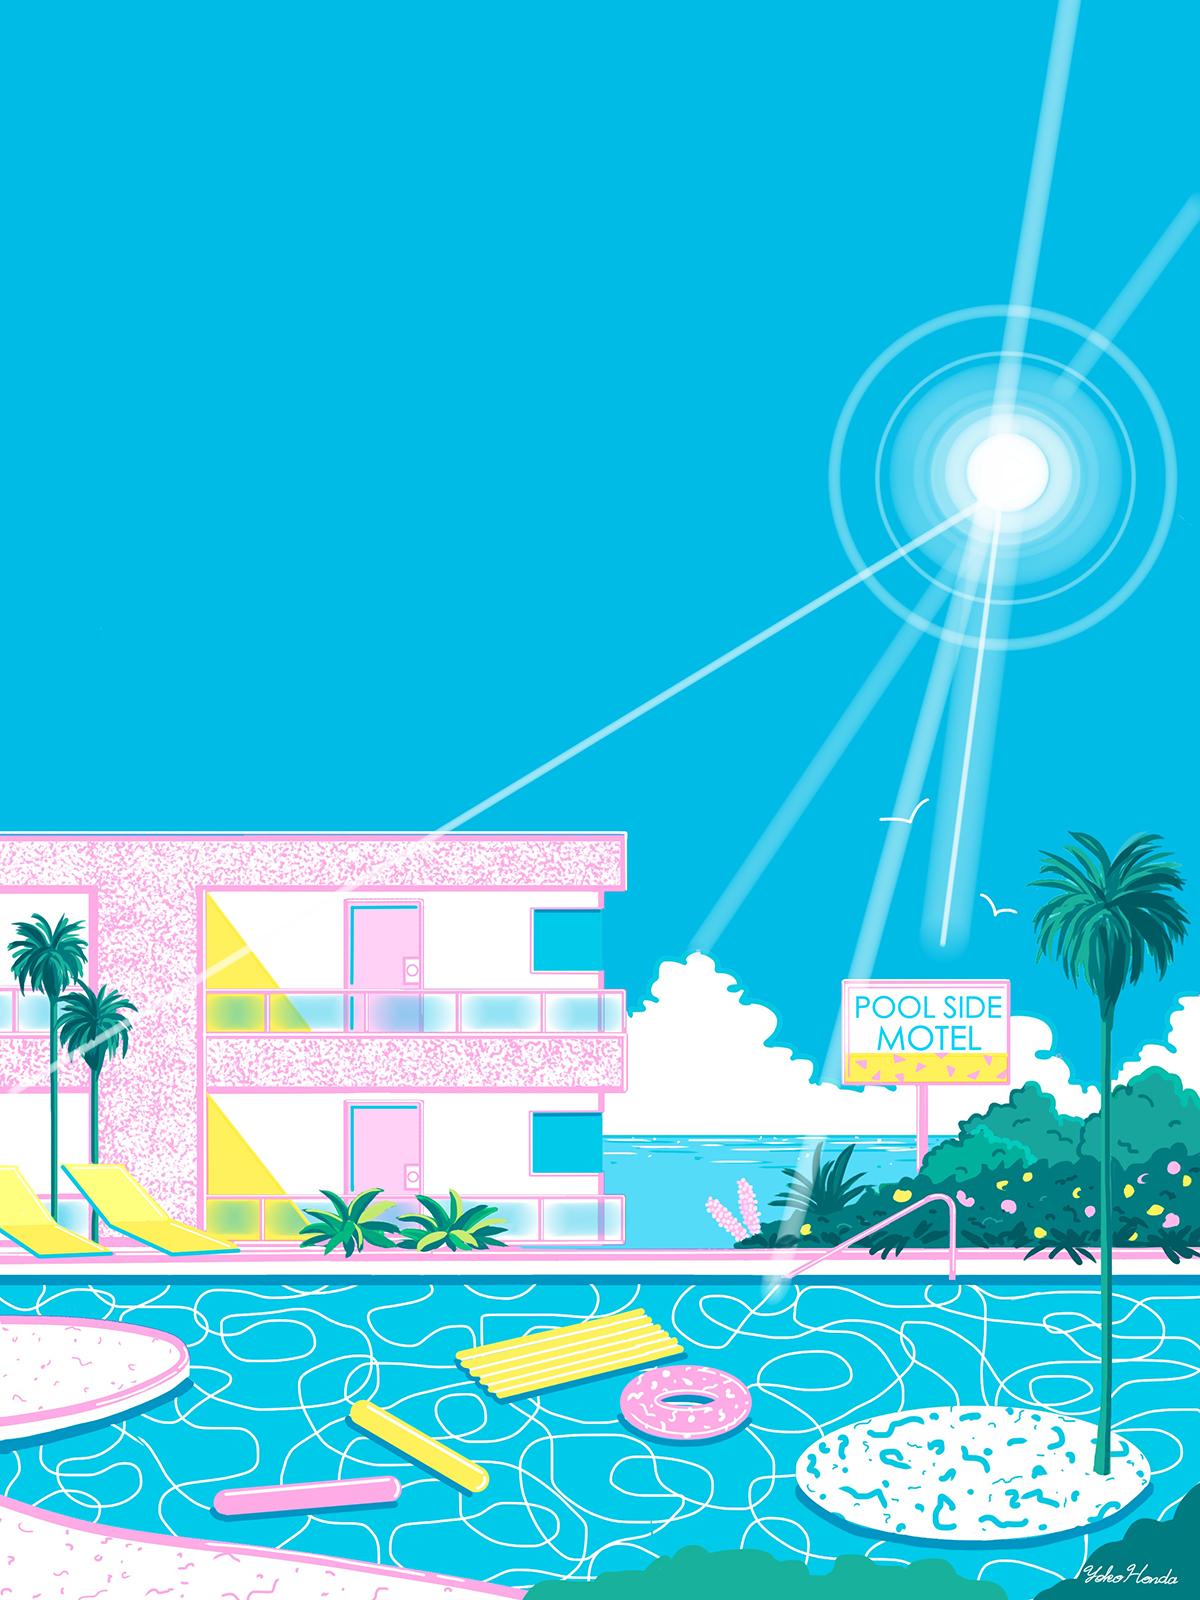 Artist Yoko Honda creates 80's inspired art